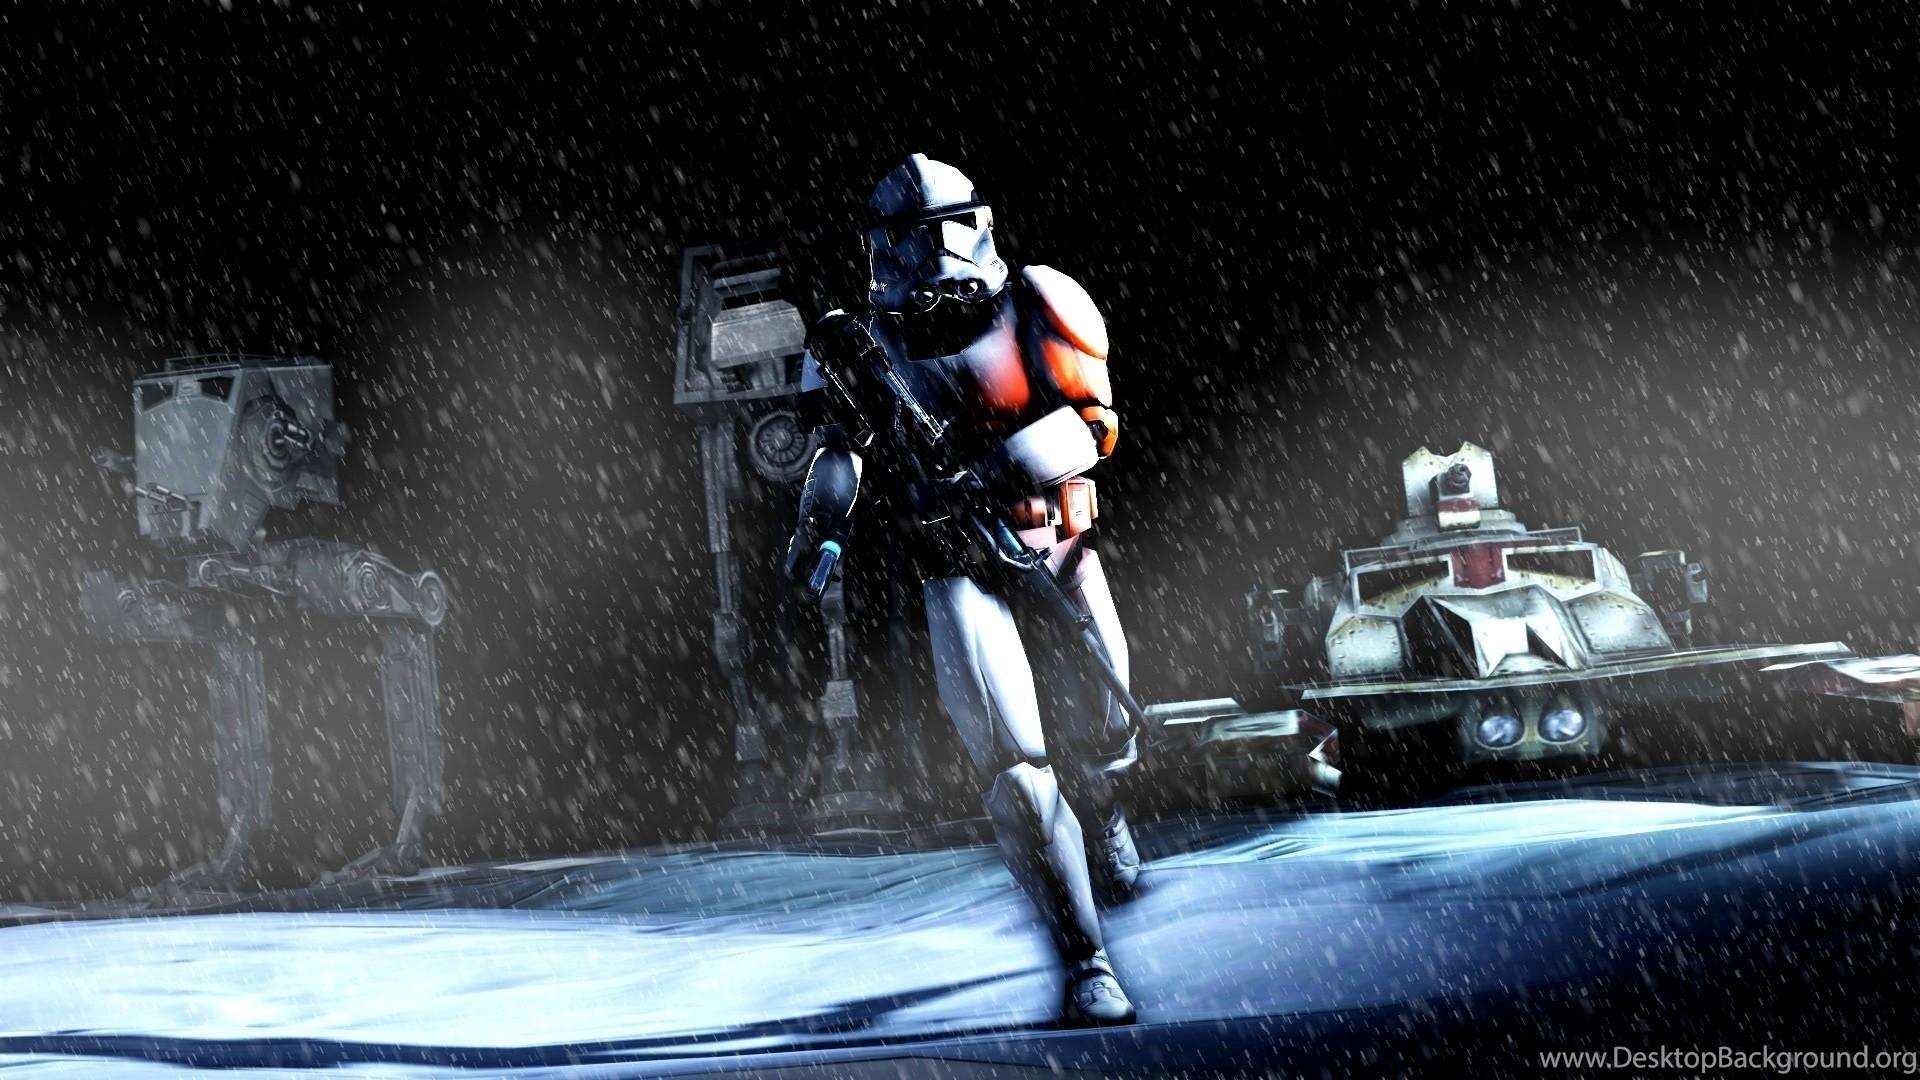 Star Wars Battlefront In Rain Wallpaper Hd Jpg Desktop Background